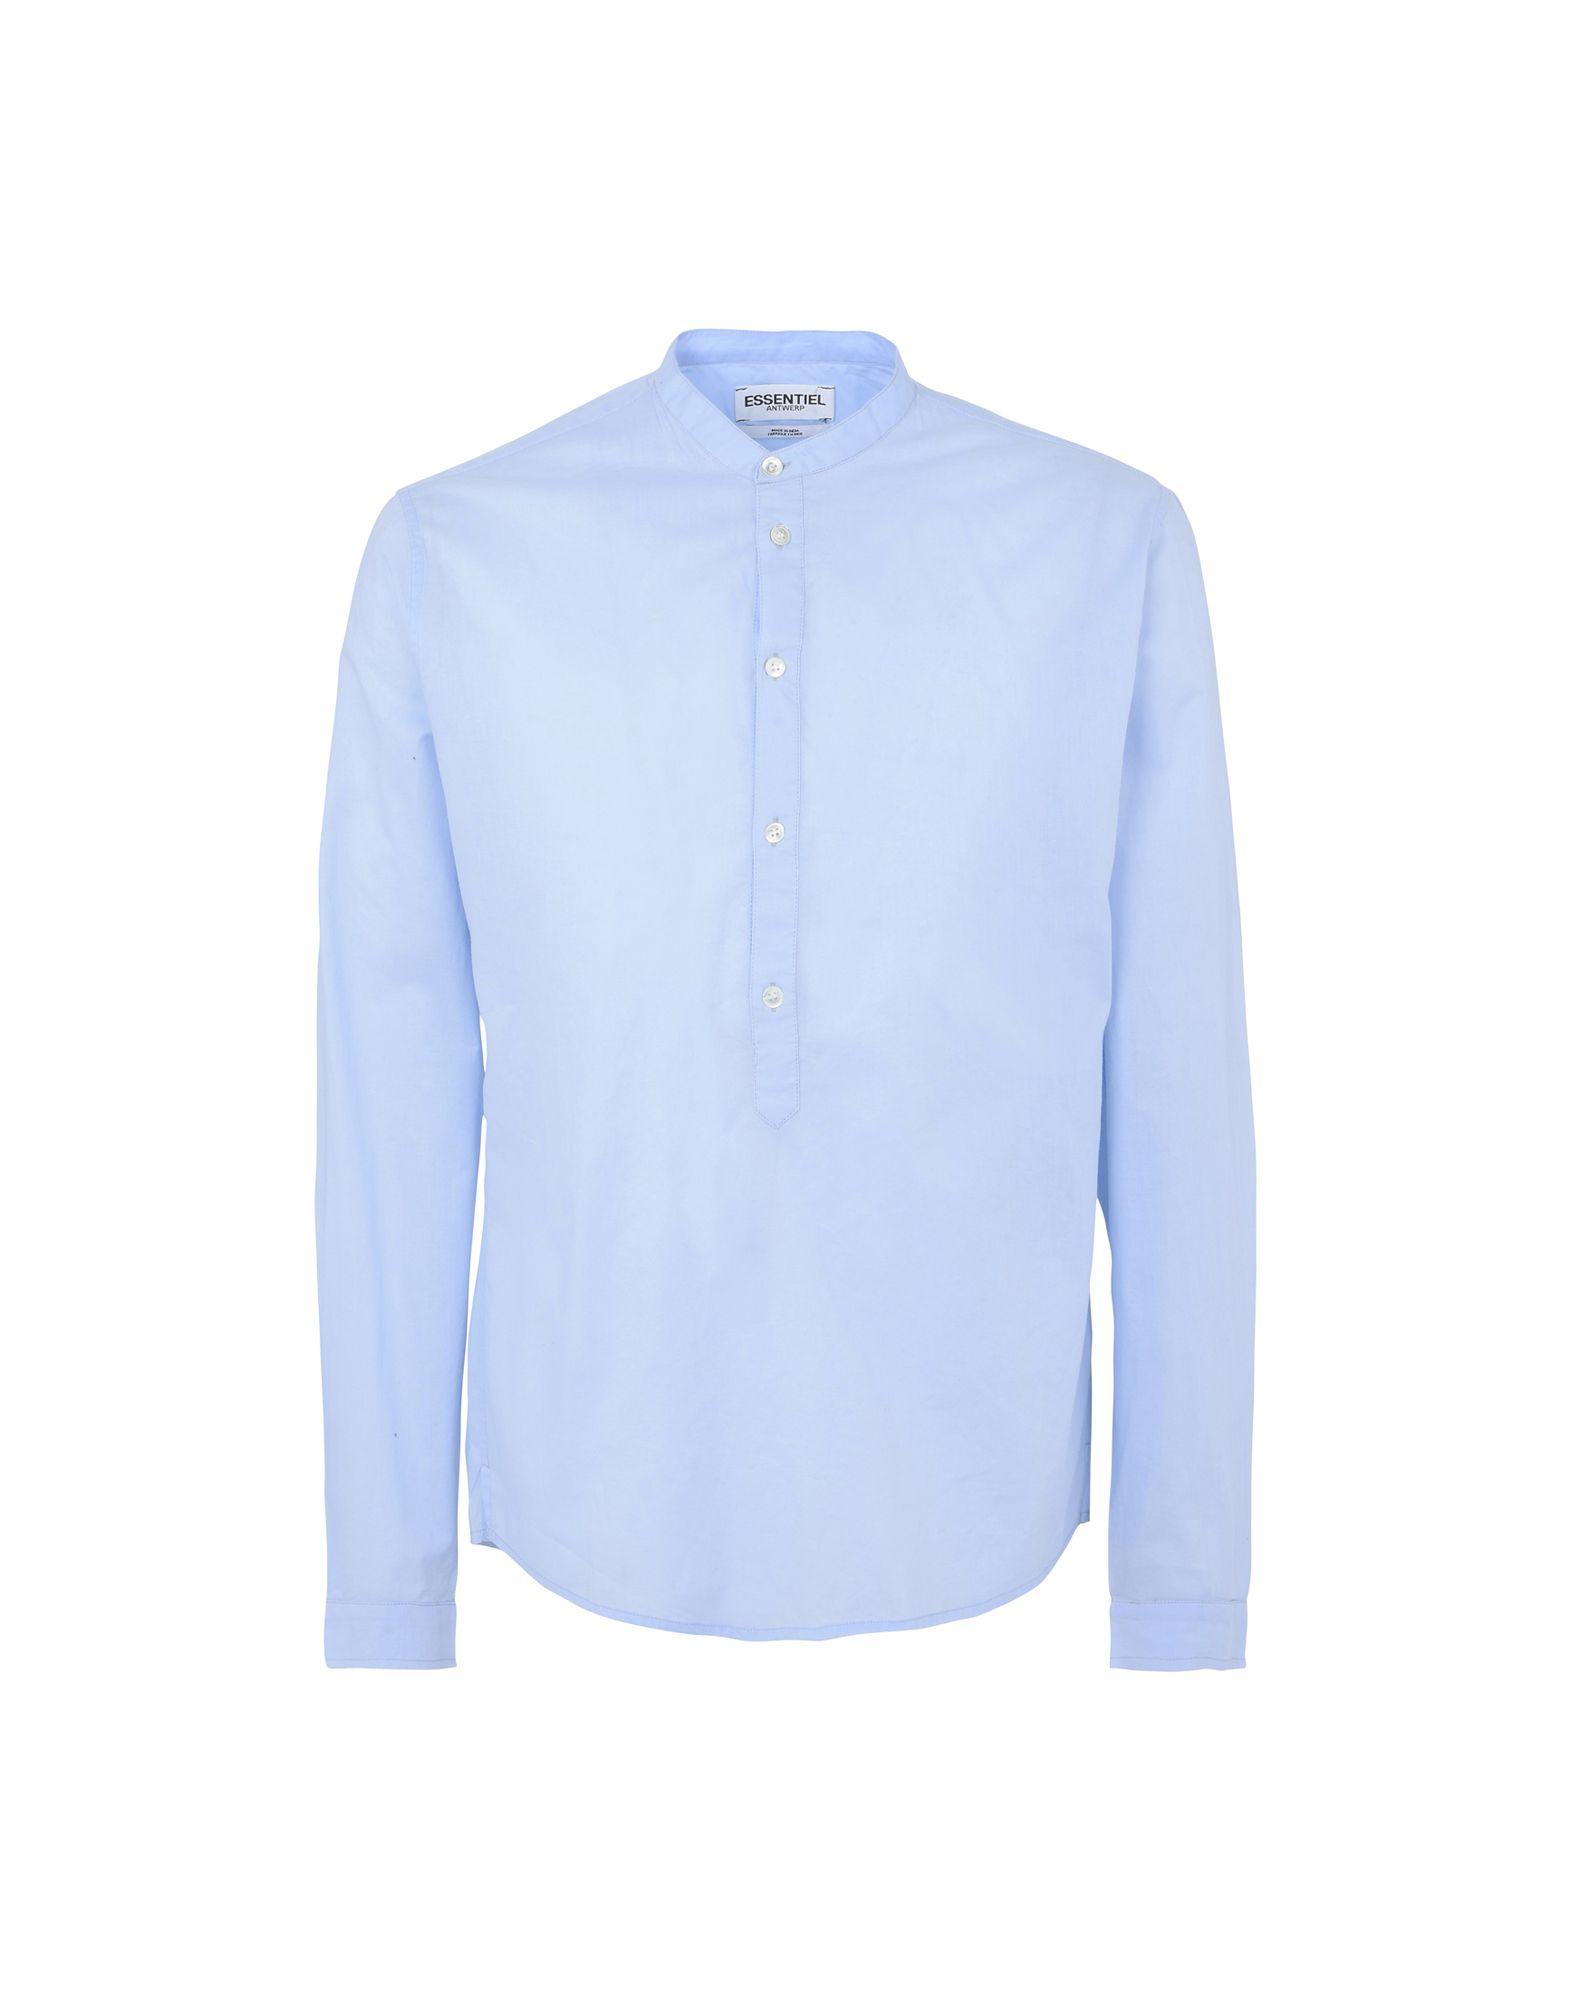 Camicia Tinta Unita Essentiel Antwerp M-Kaffir Polo Placket Shirt - Uomo - Acquista online su